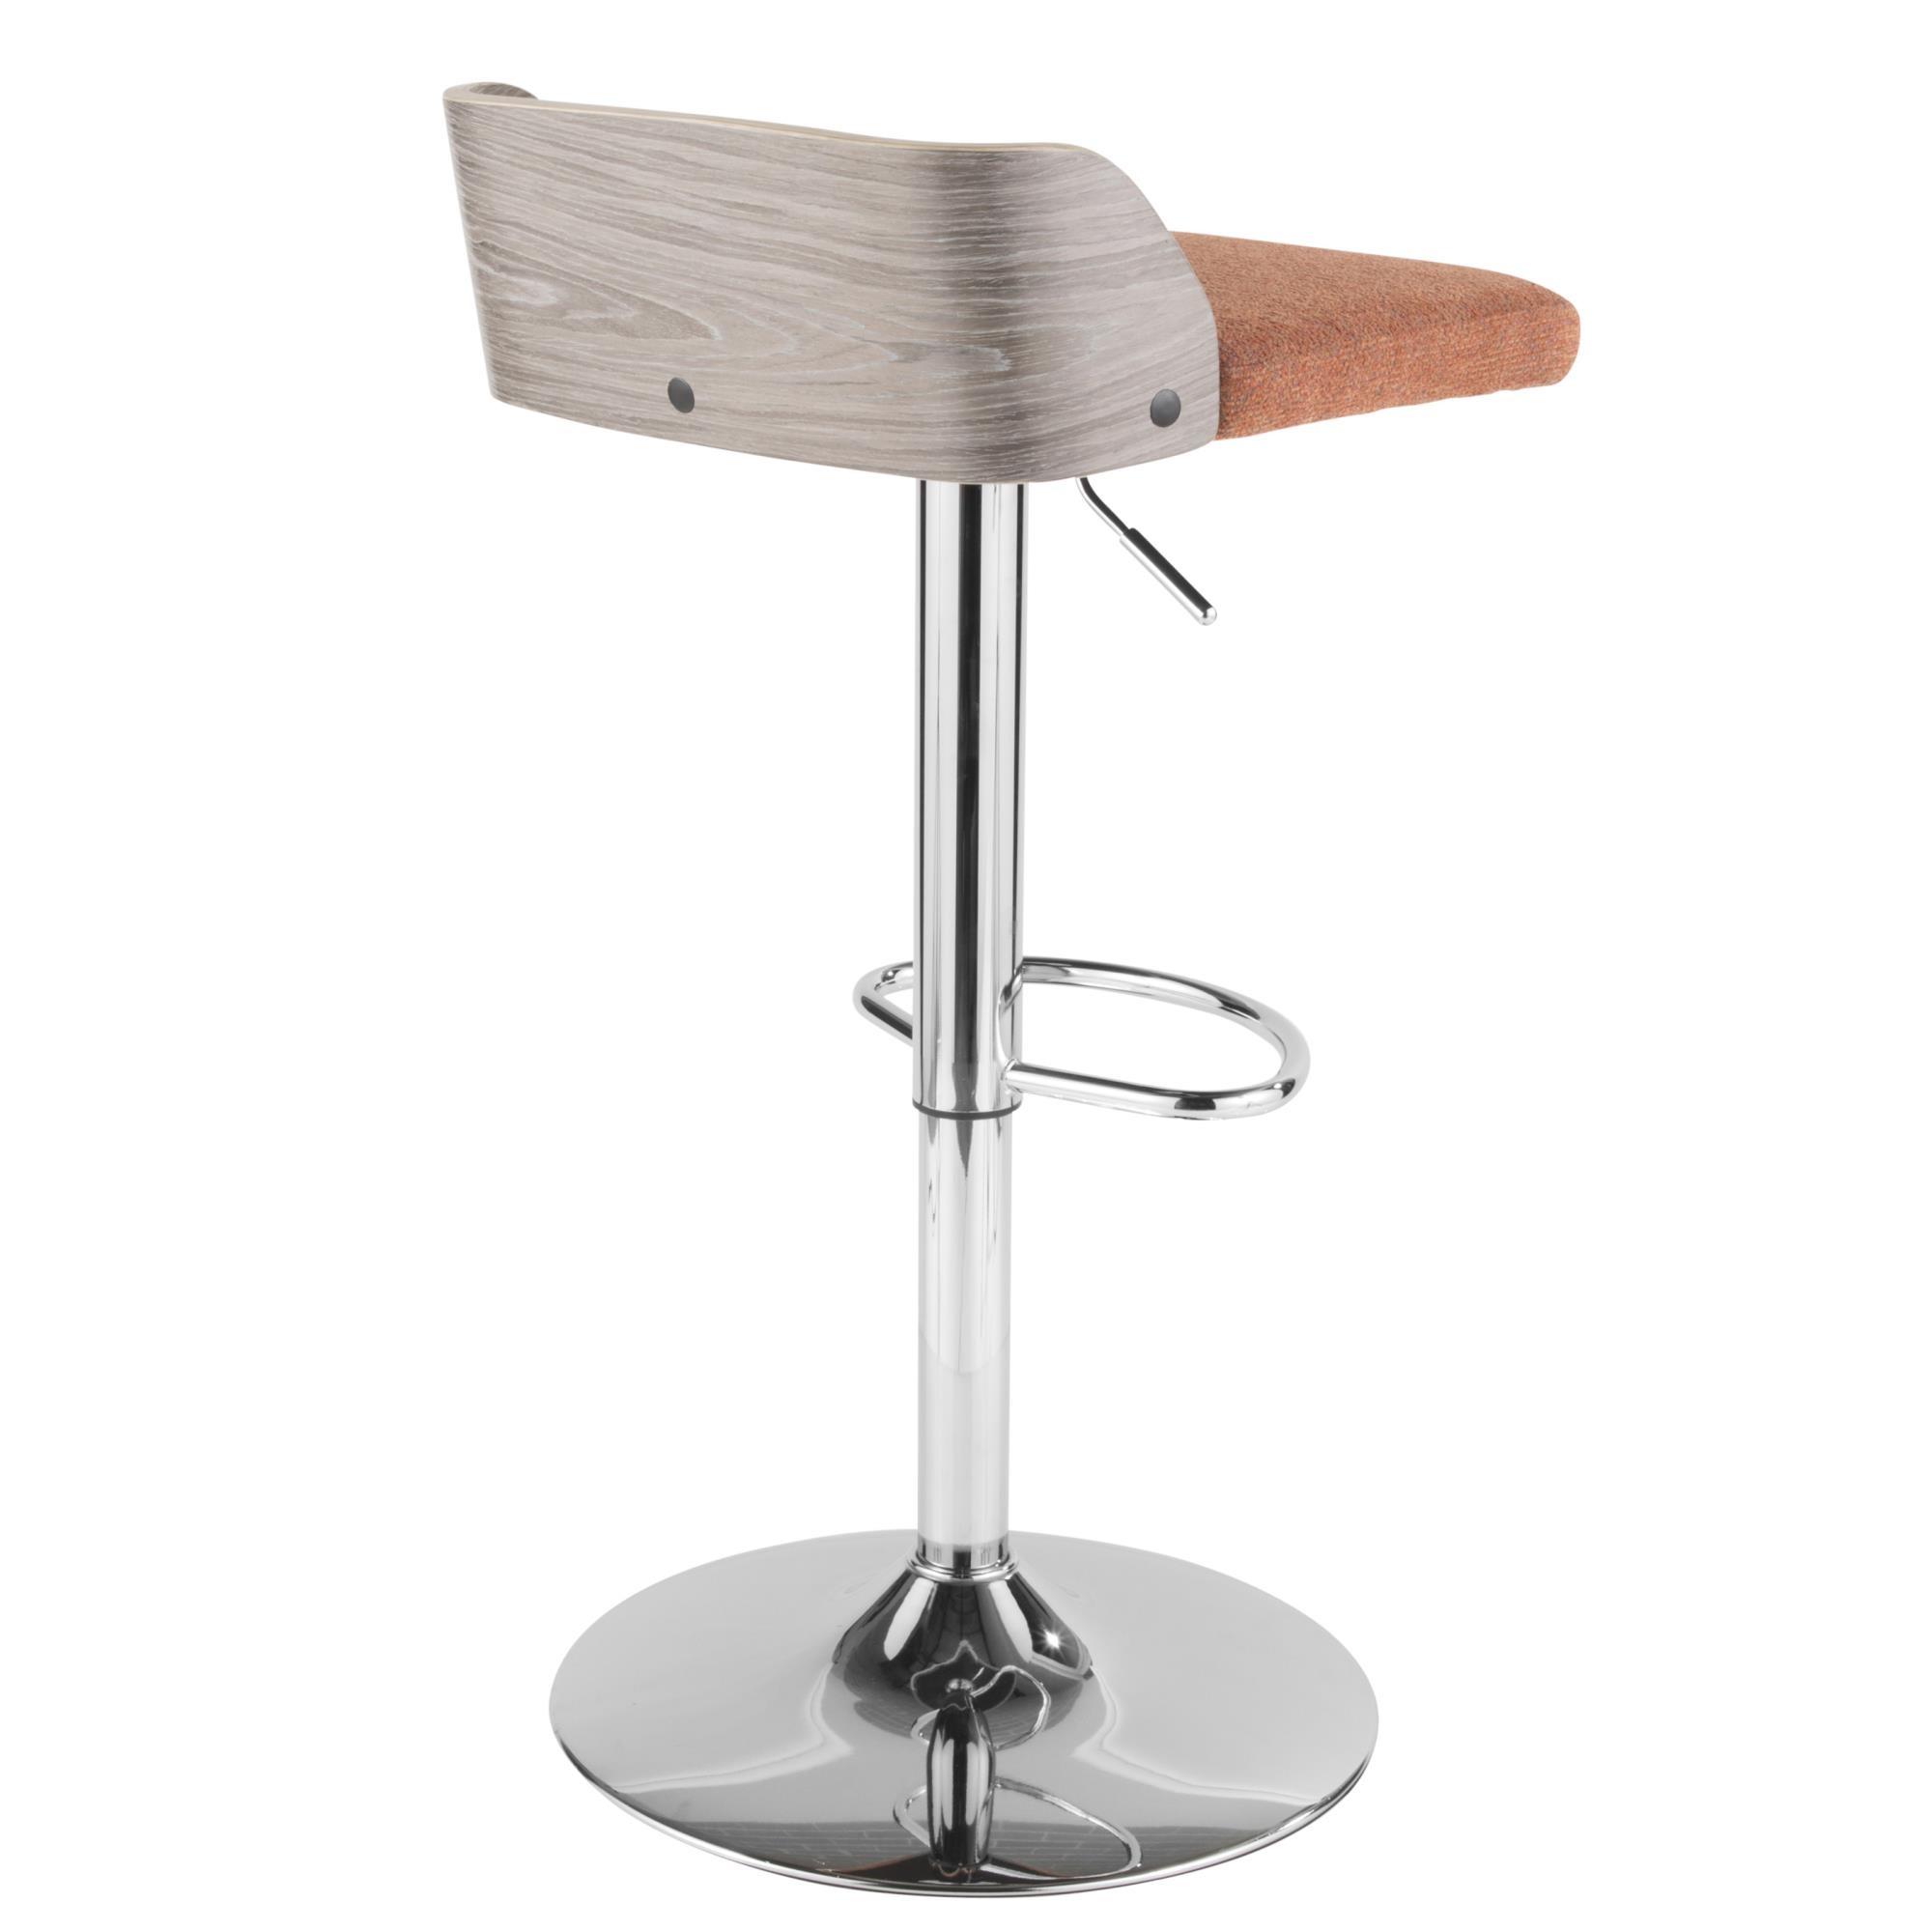 Stupendous Maya Barstool Lumisource Stylish Decor At Affordable Prices Evergreenethics Interior Chair Design Evergreenethicsorg